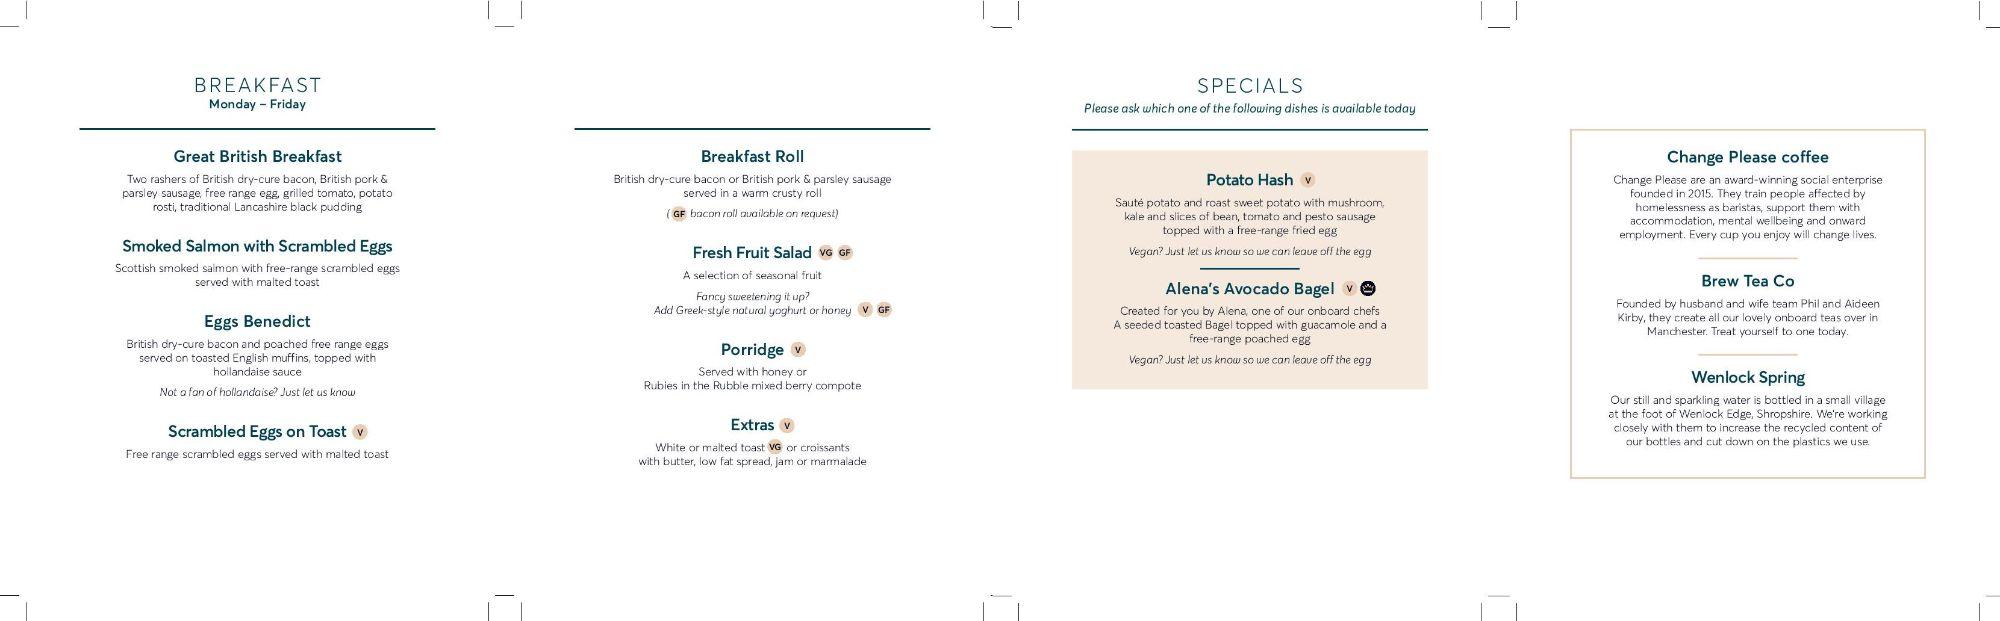 Image showing a sample of the Avanti West Coast breakfast menu, circa 2020.